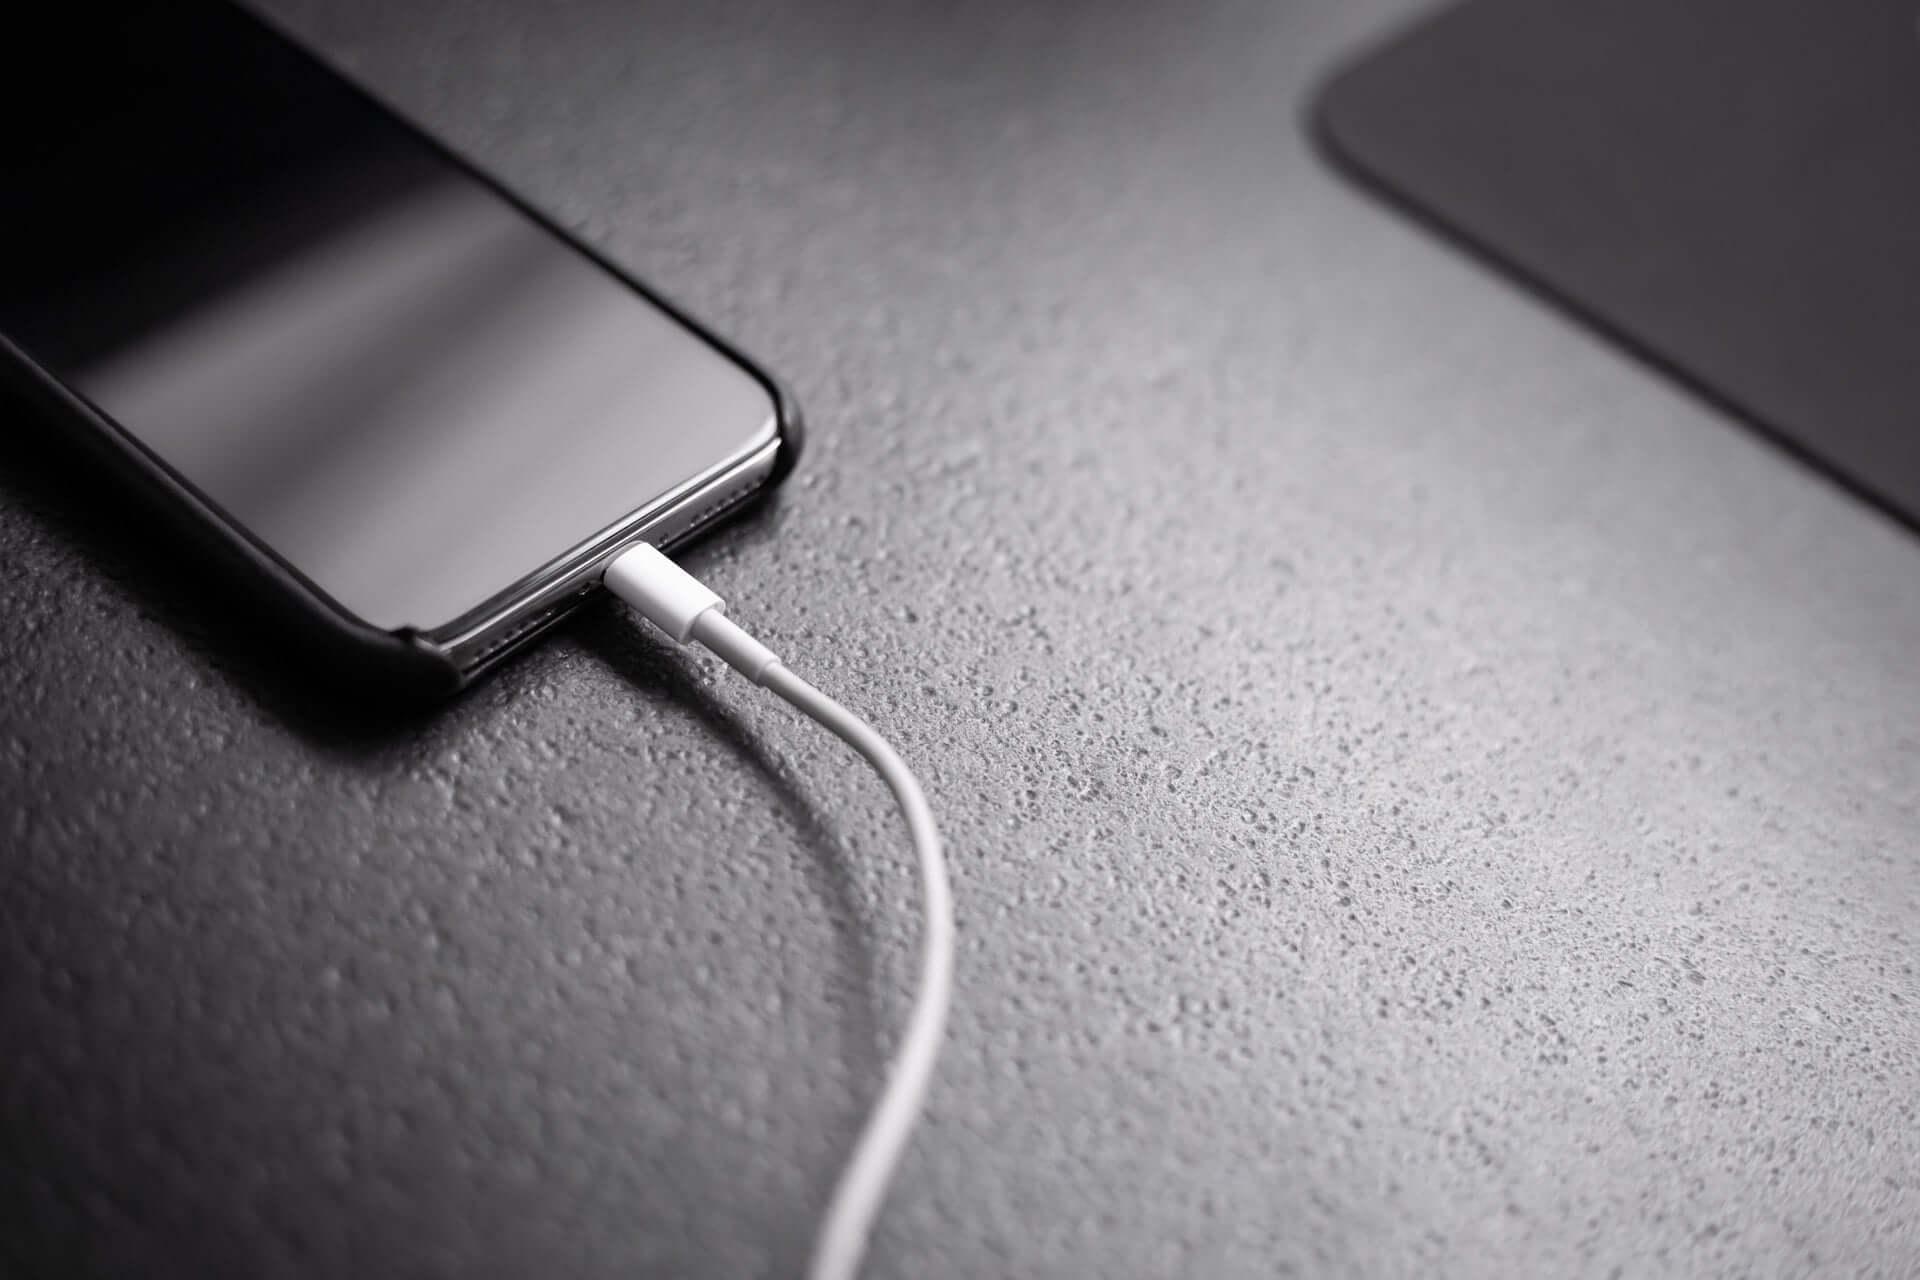 iPhone充電時に気になる「あの音」が2度鳴るのはなぜ? tech190819_iphone_charge_main-1920x1280